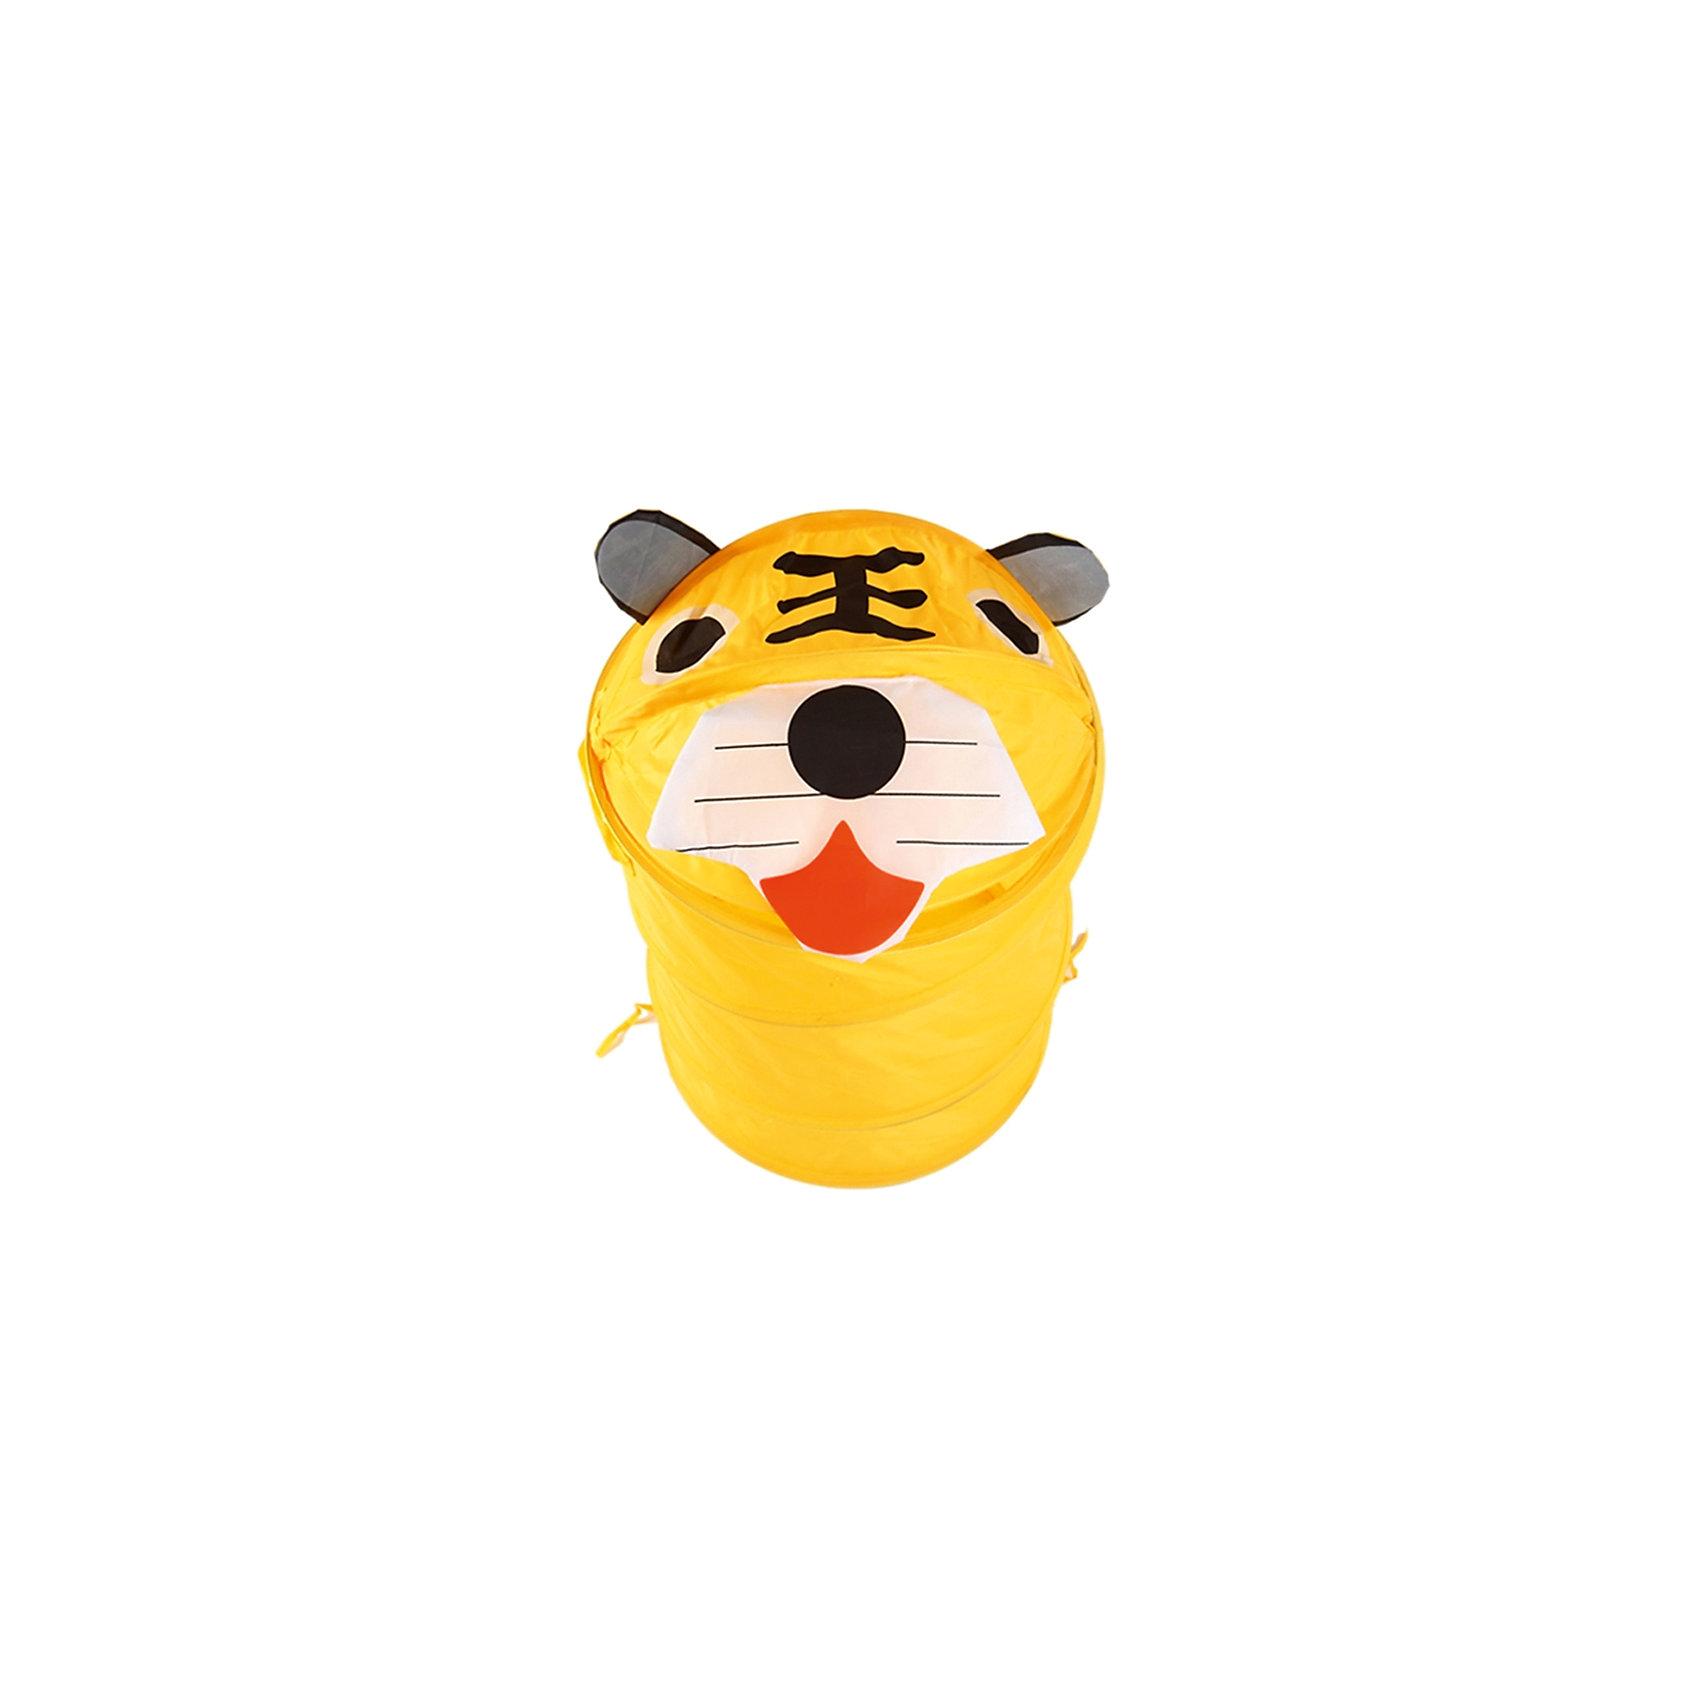 - Корзина для игрушек Тигренок [супермаркет] иномат импорт jingdong офиса хранение корзины кухня хранение корзина отделка корзина корзина хранения pink